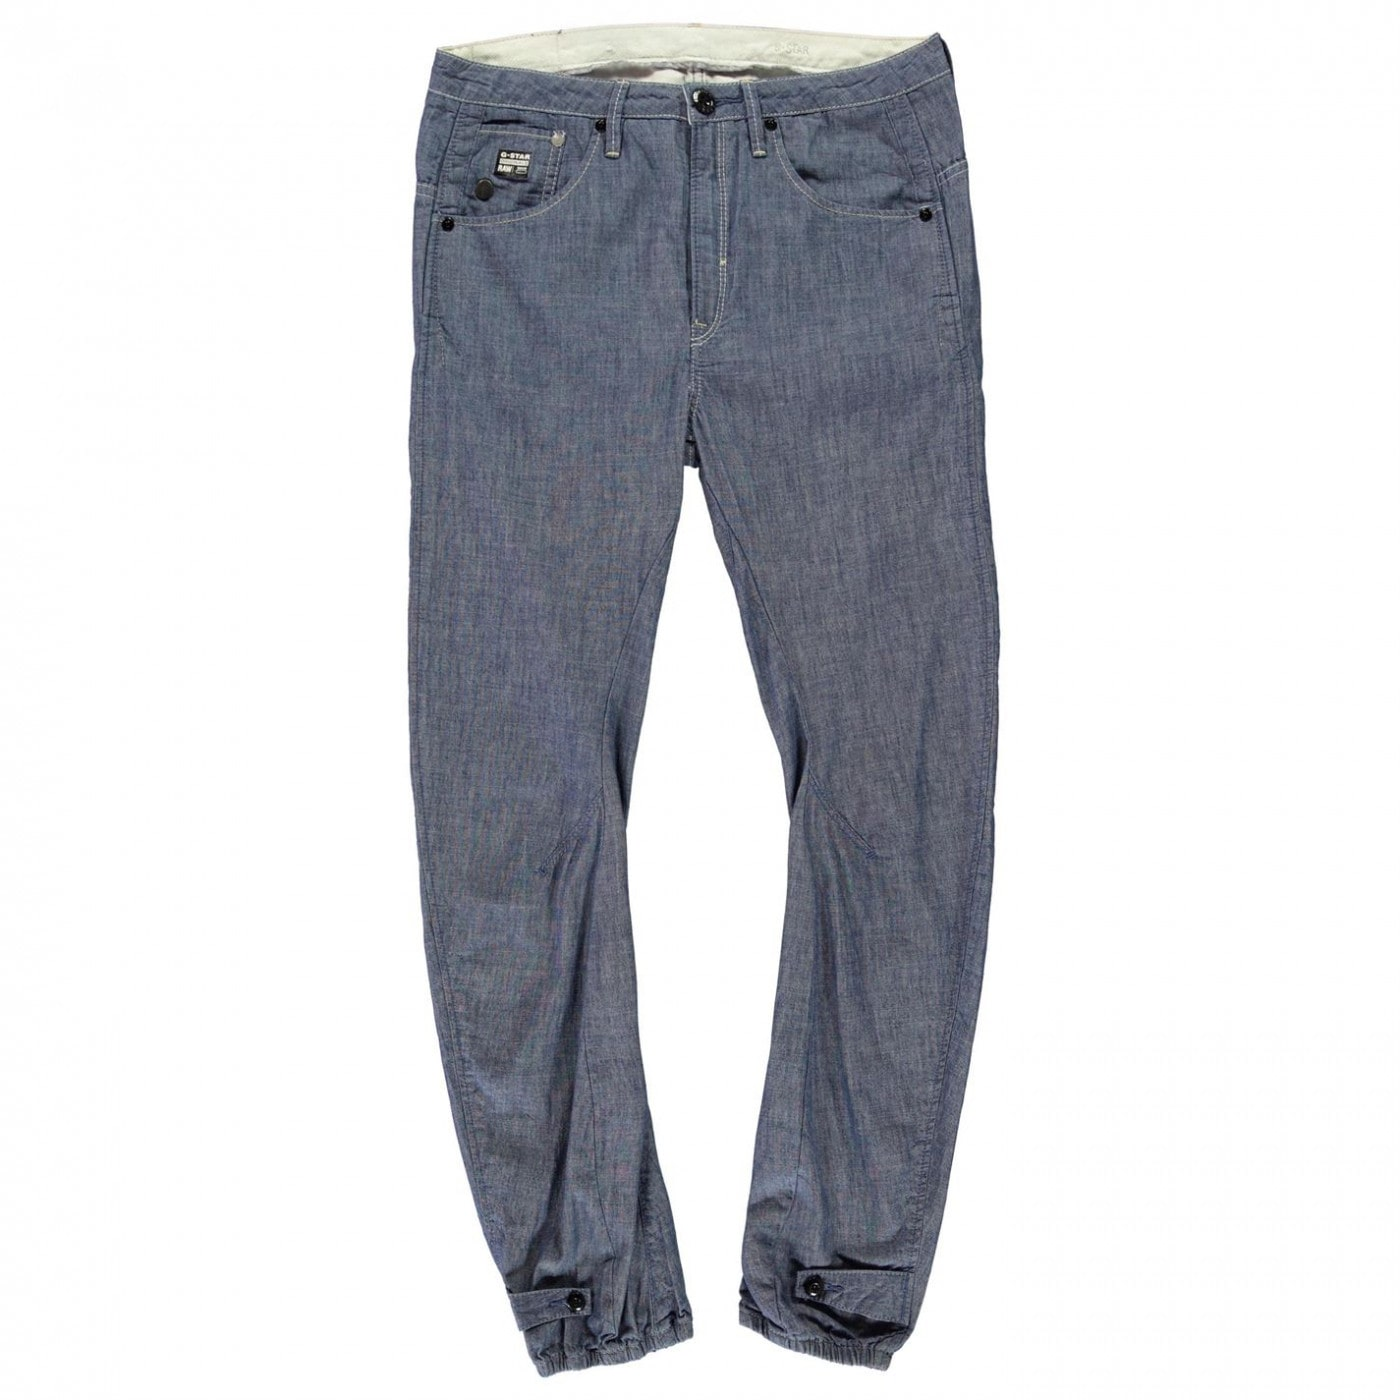 G Star 60699 Jeans